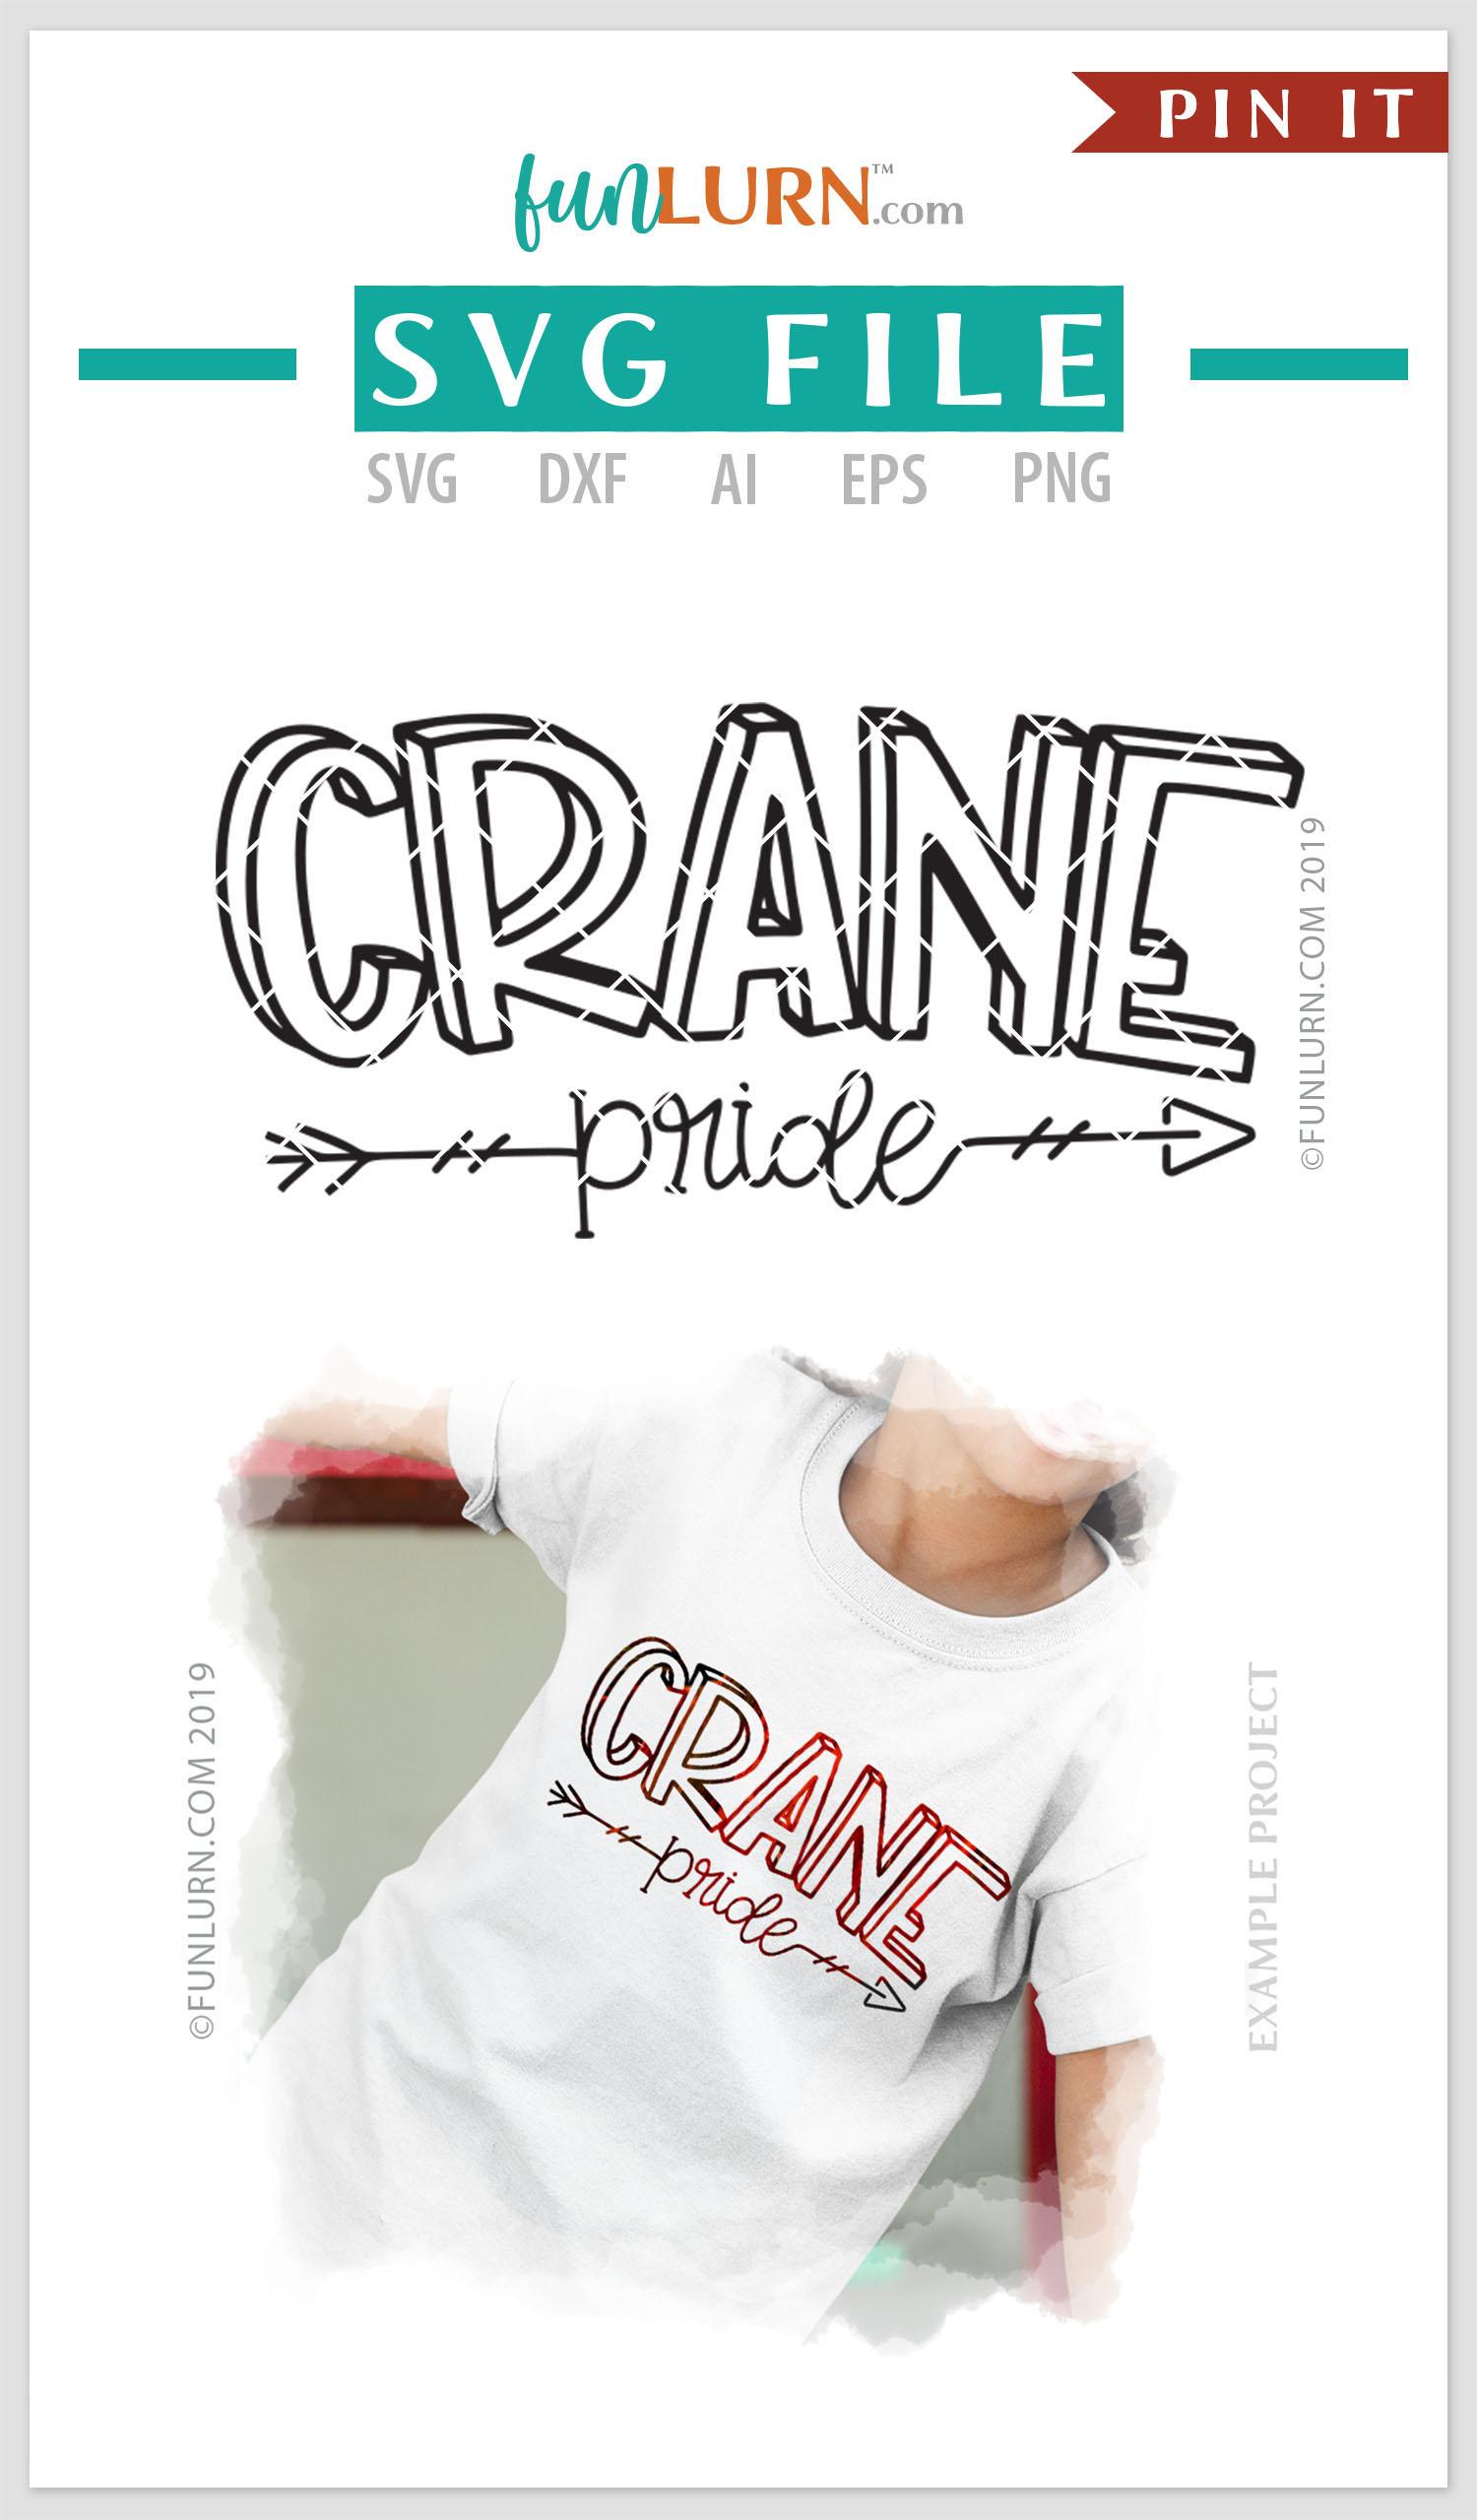 Crane Pride Team SVG Cut File example image 4